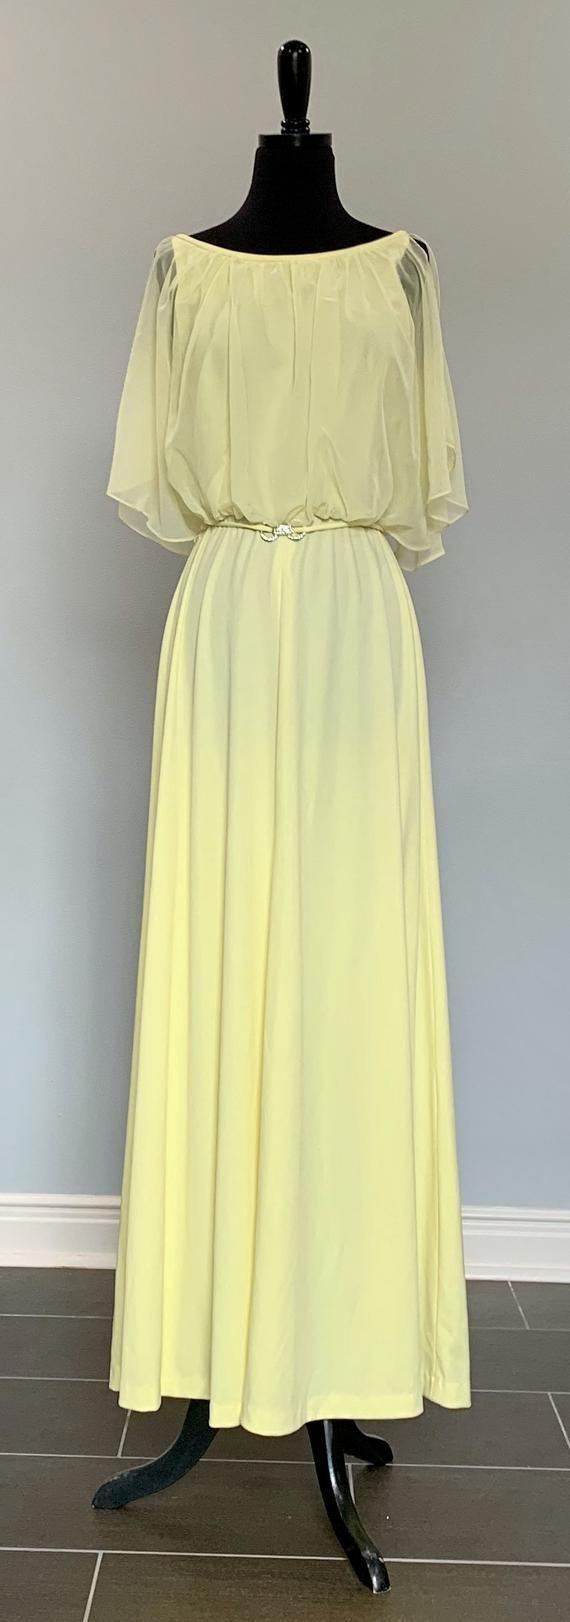 1970s Montgomery Ward Lemon Yellow Chiffon Formal Maxi Dress Size 6 8 Semi Formal Bridesmaid Pro Elegant Dresses Long Maxi Dress Formal Semi Formal Dresses [ 1622 x 570 Pixel ]